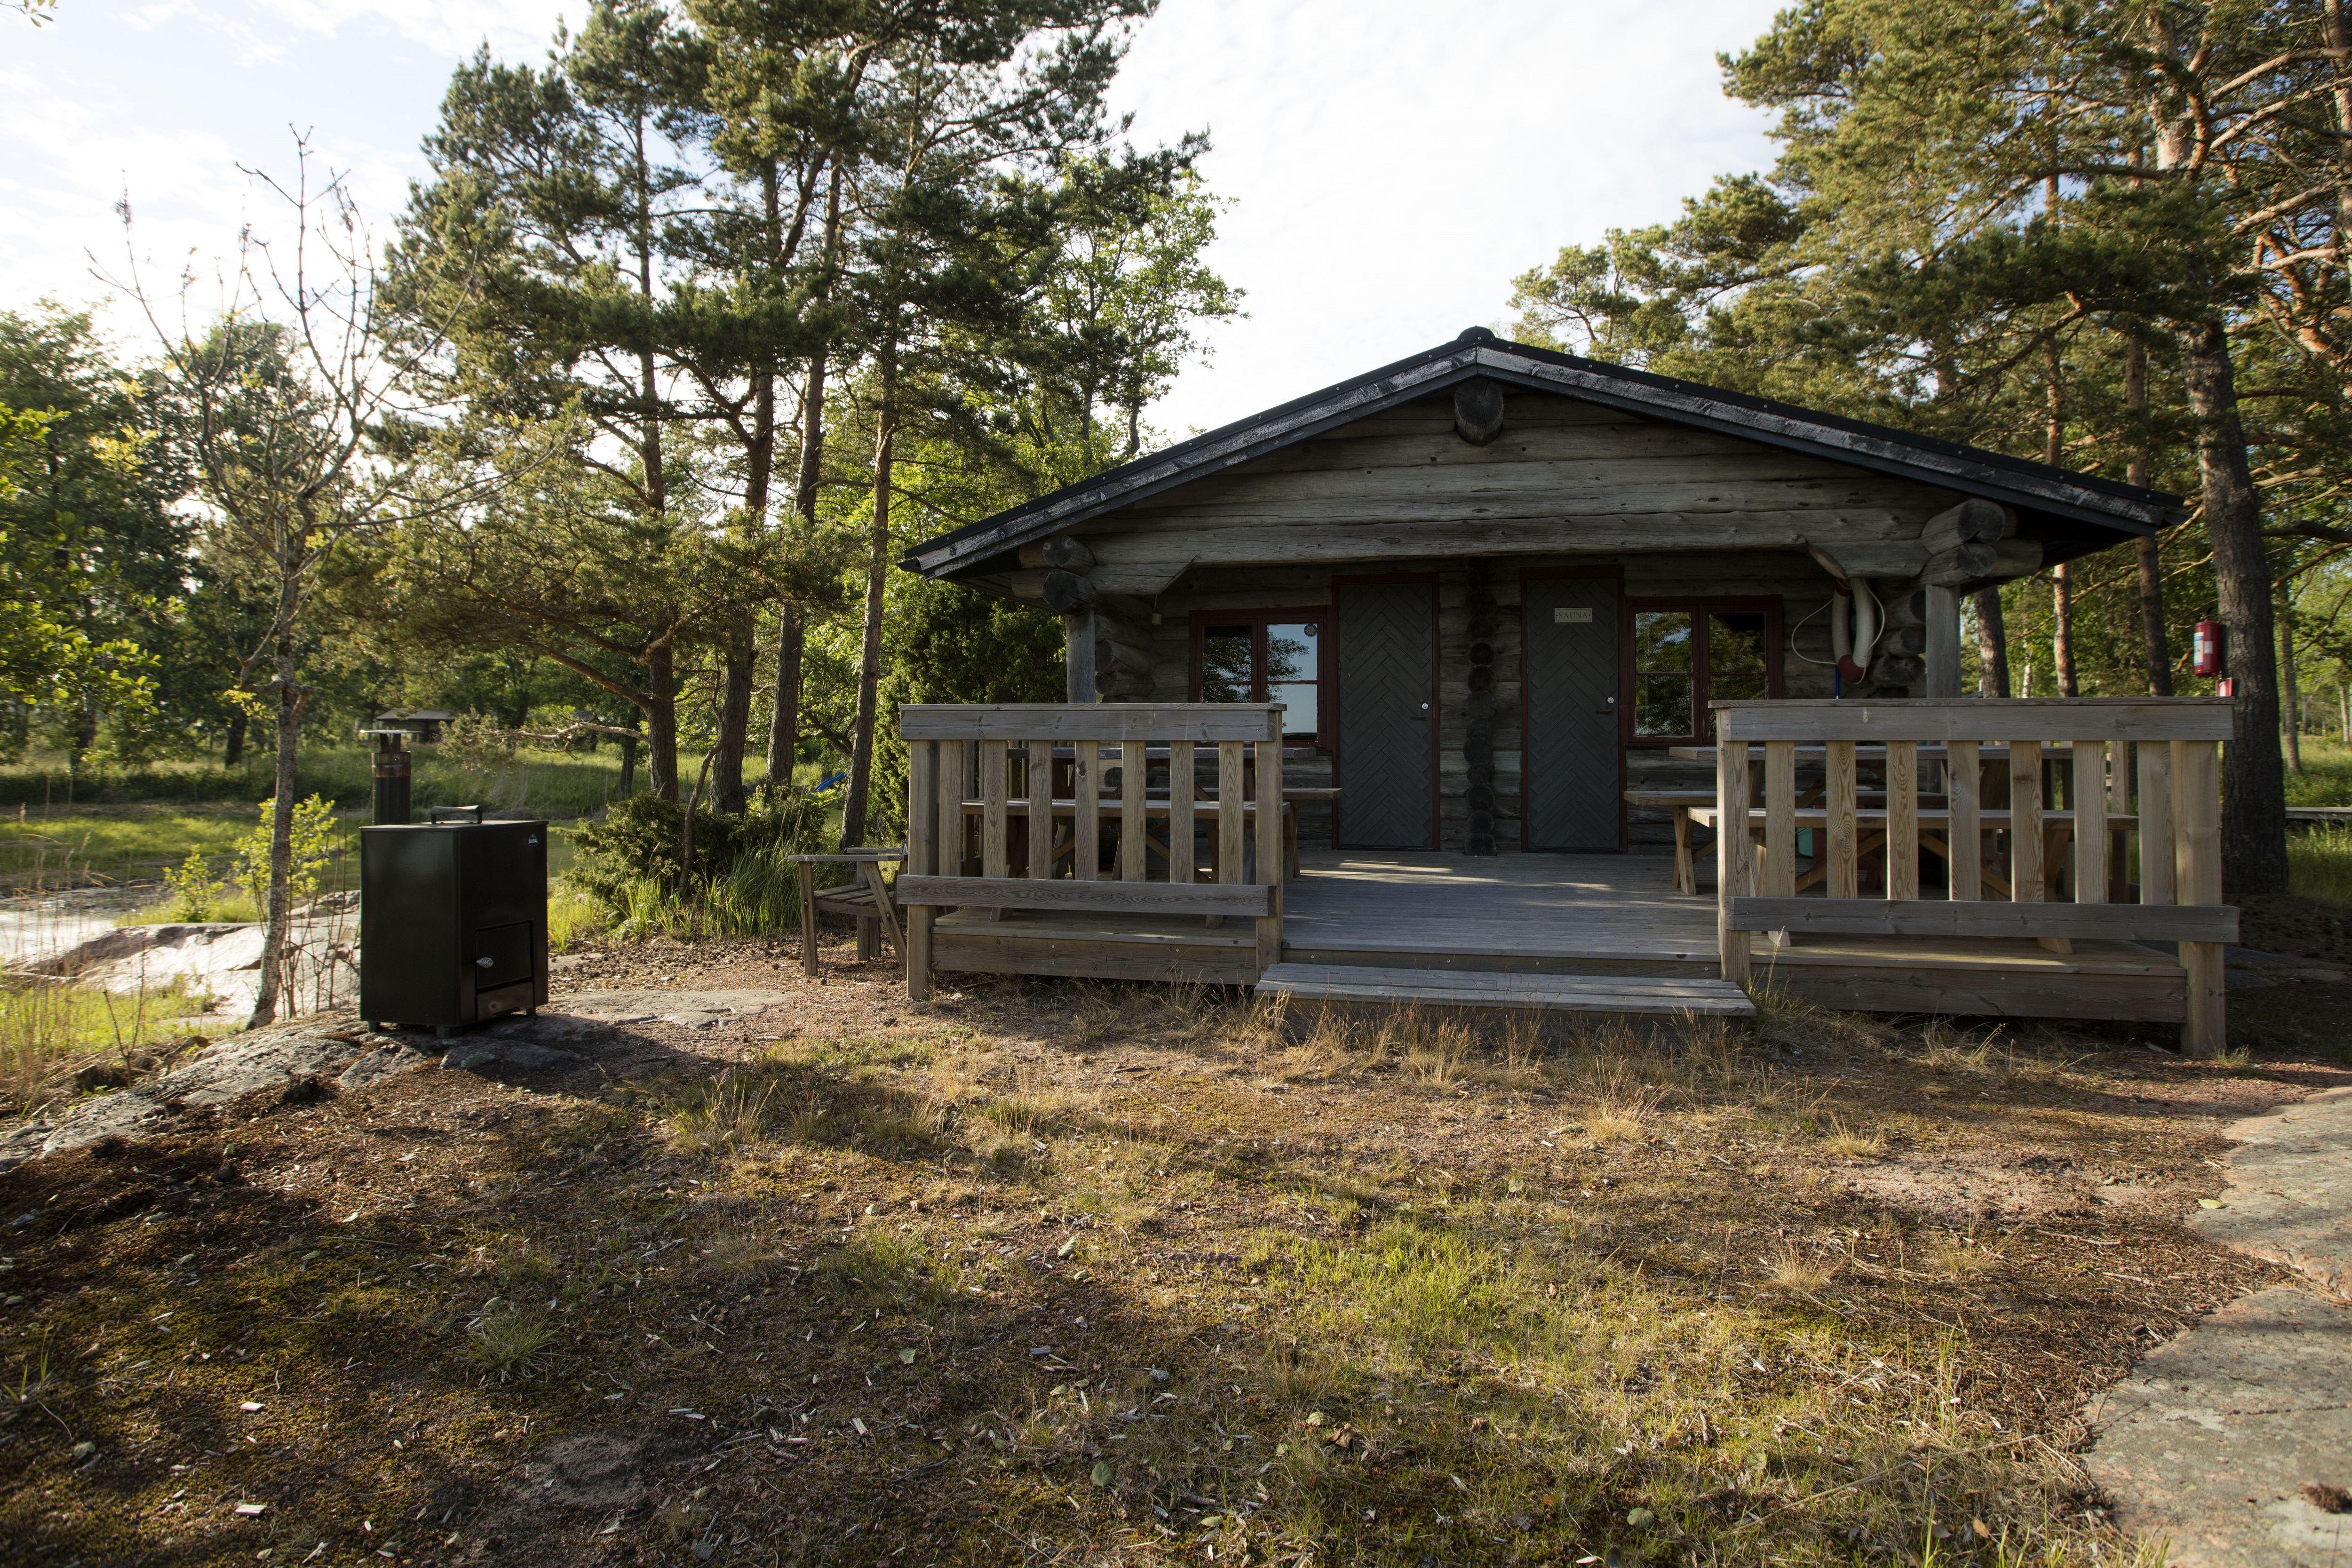 Eden's Cottages